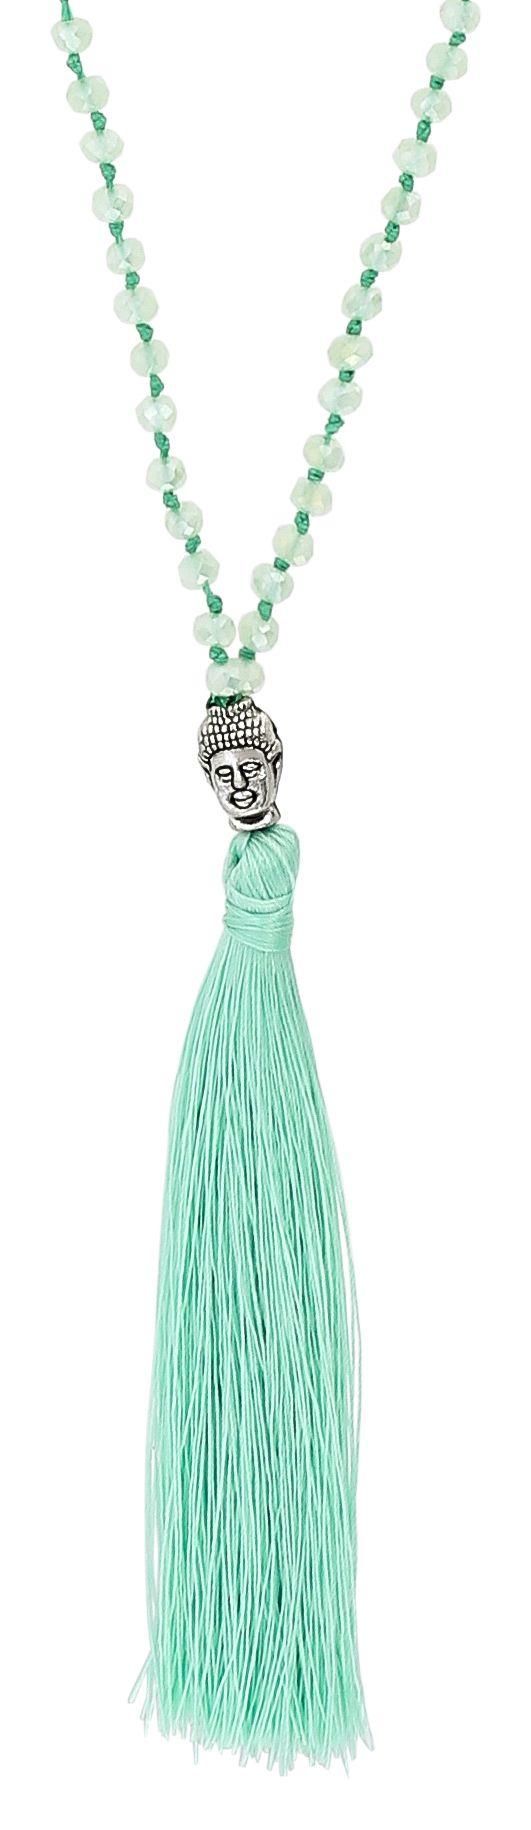 Kette Green Light Buddha Tassel necklace, Jewelry, Bijoux